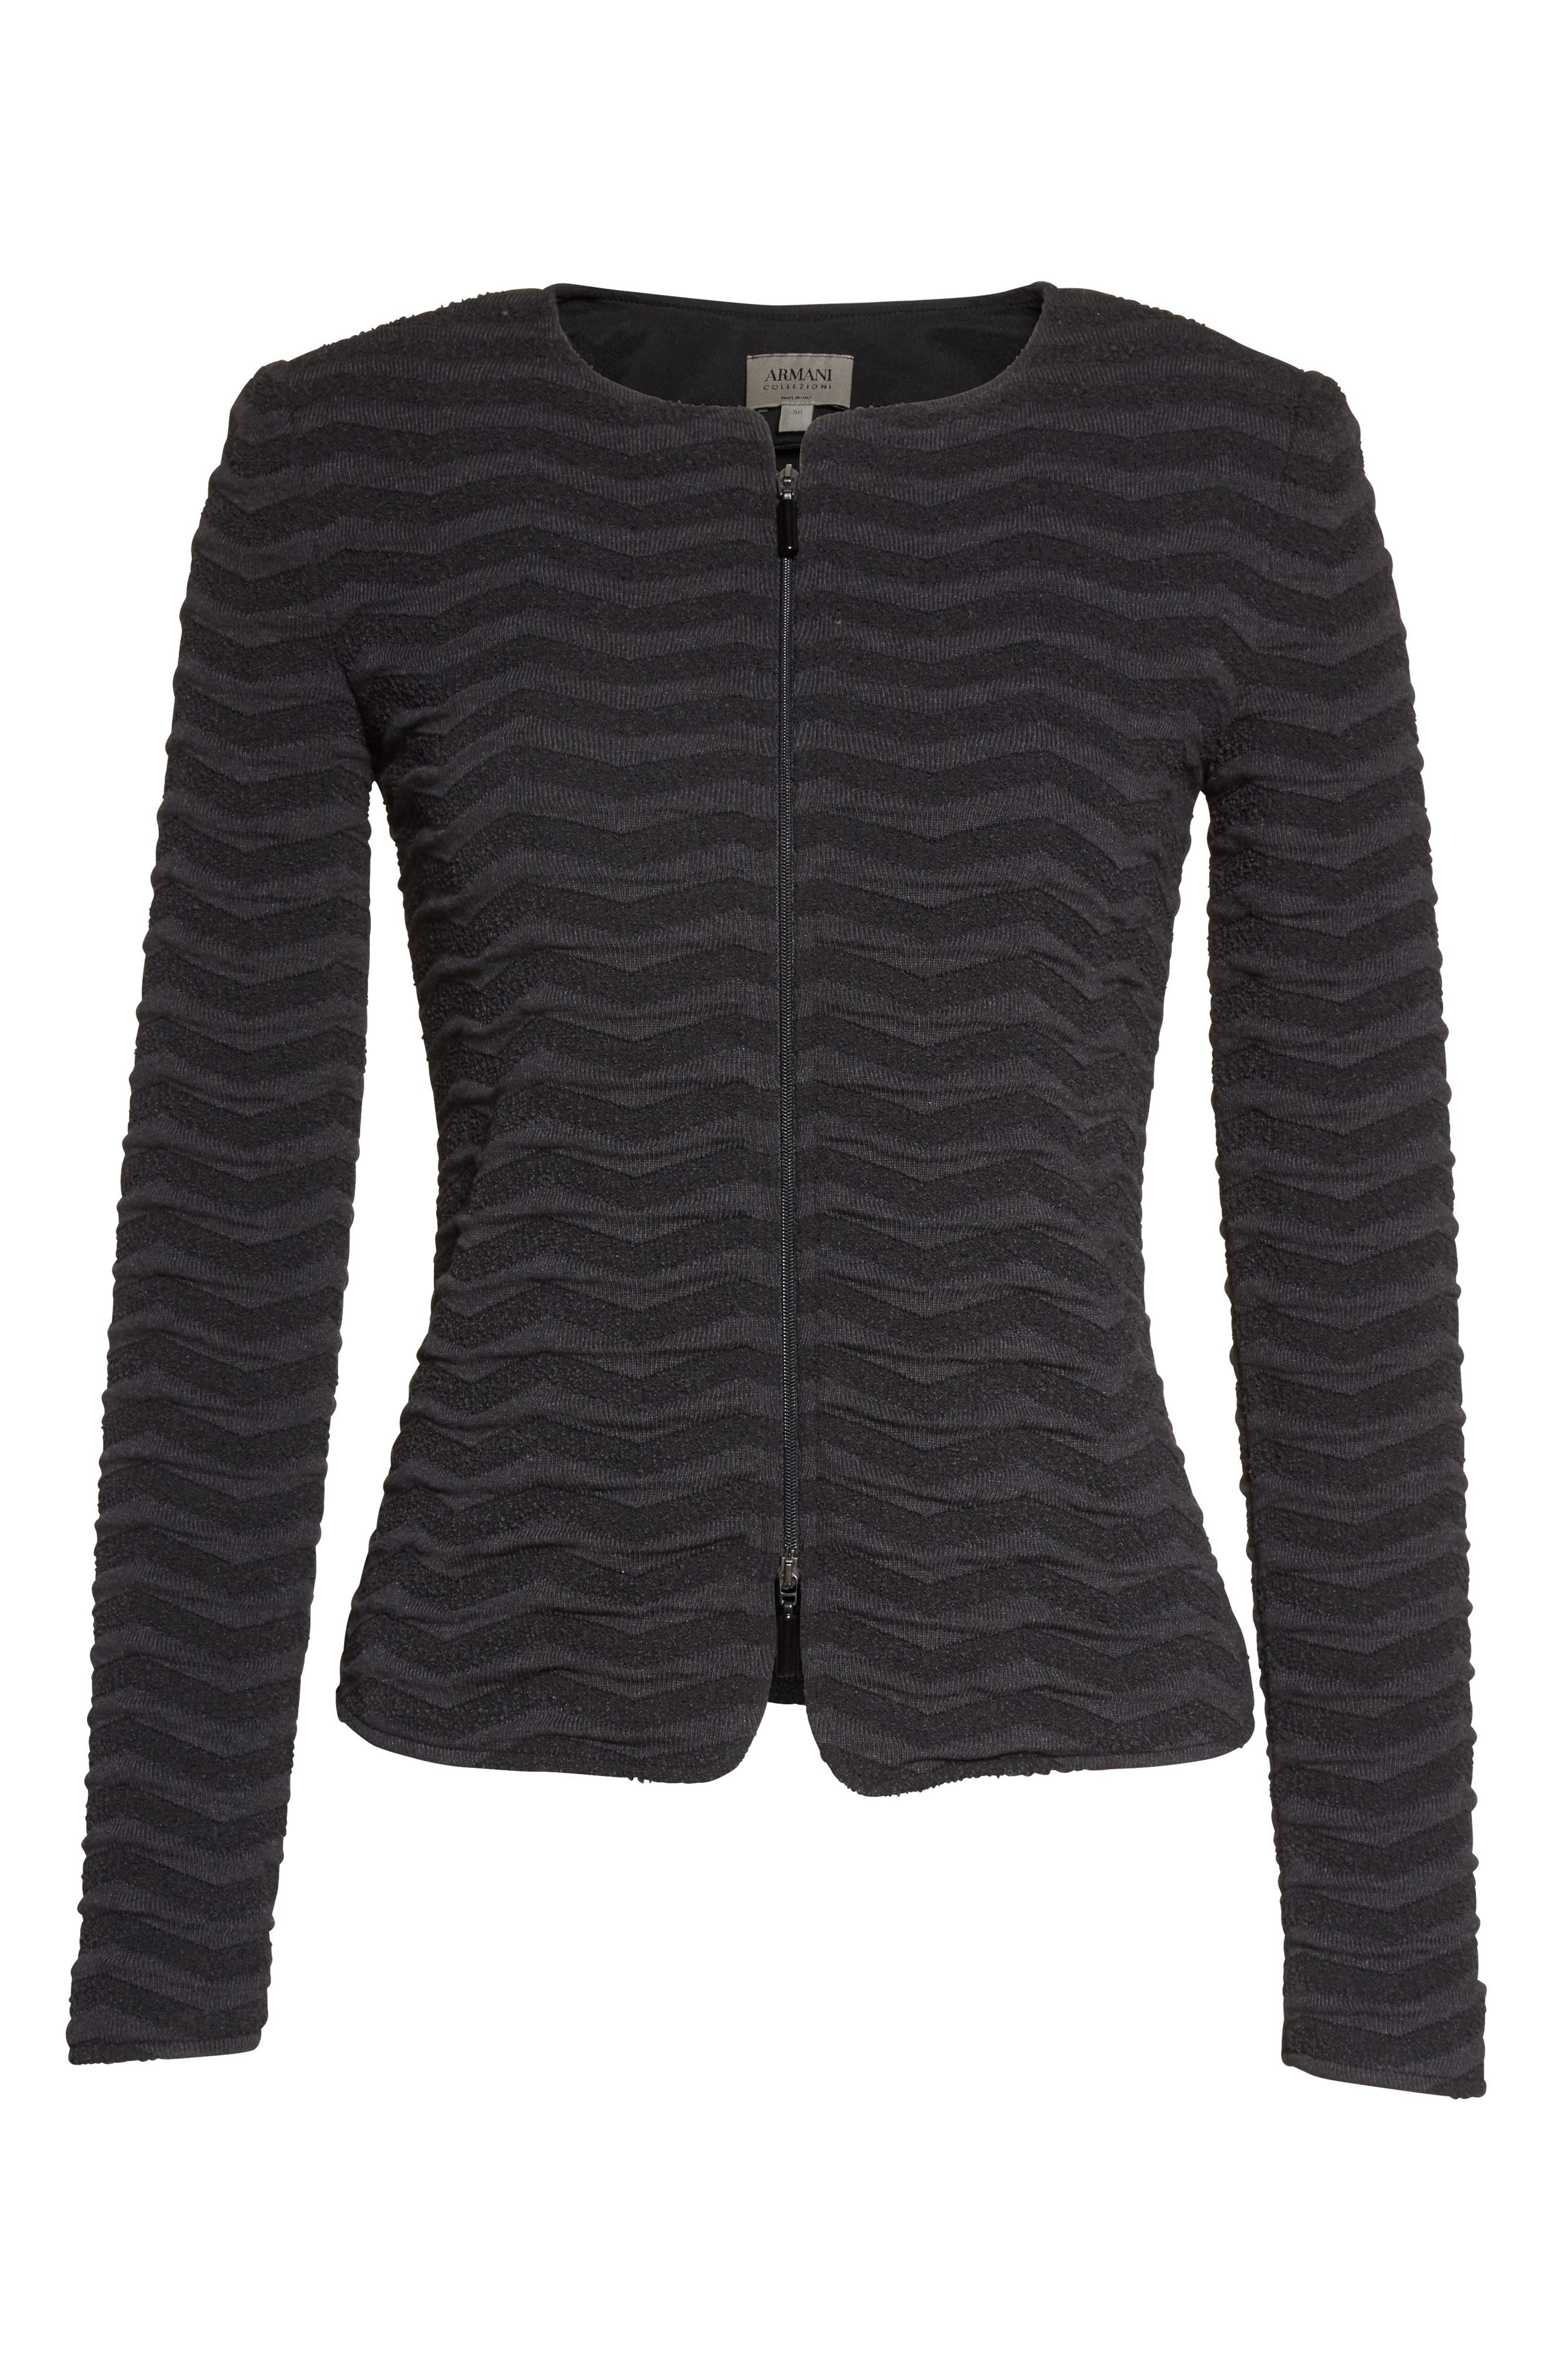 Alternate Image 4  - Armani Collezioni Embossed Jacquard Jersey Jacket